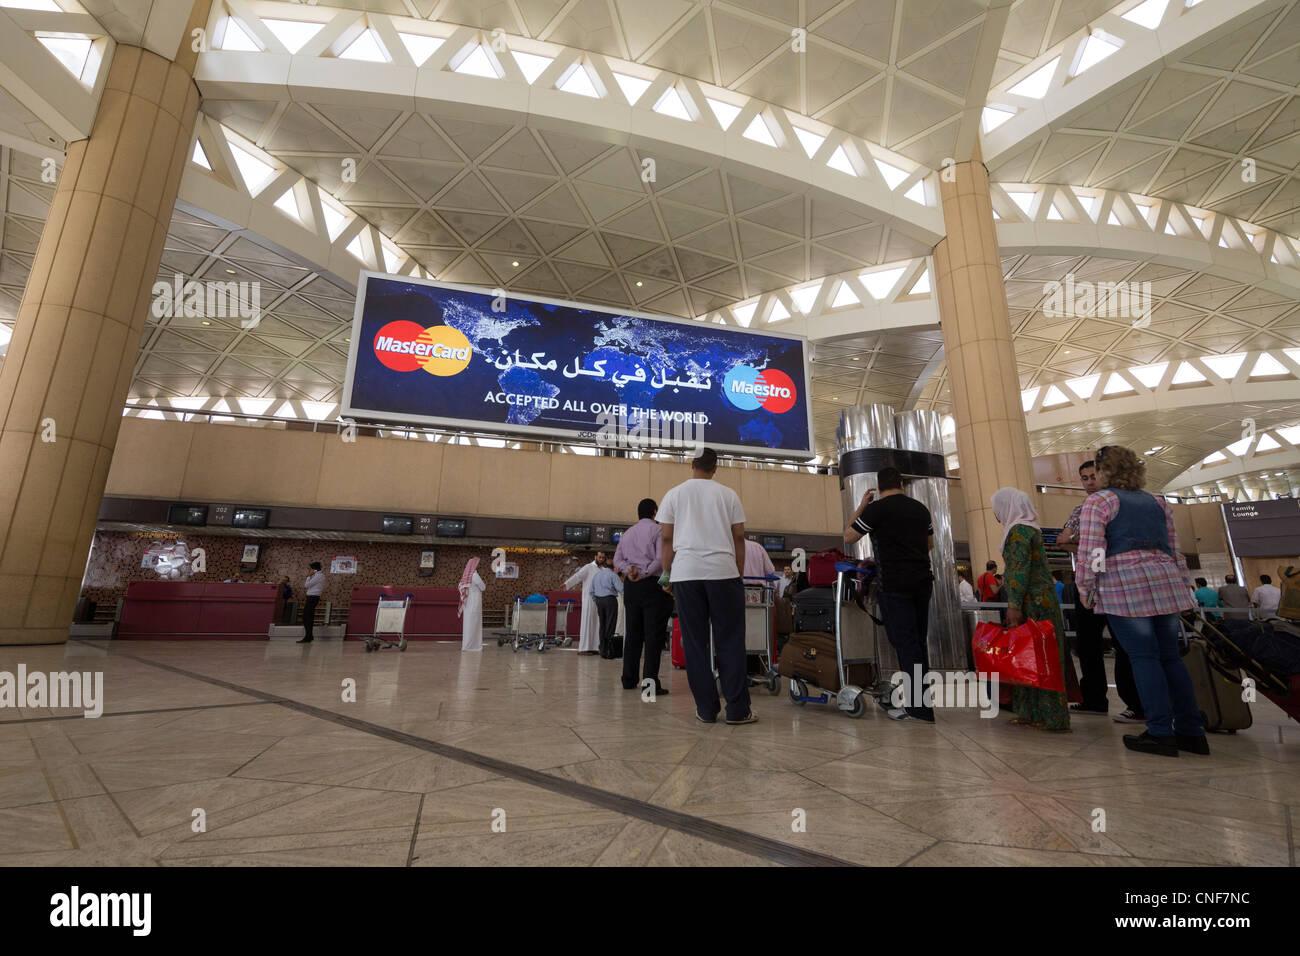 passengers checking in at Terminal 2, King Khalid International Airport, Riyadh, Saudi Arabia - Stock Image